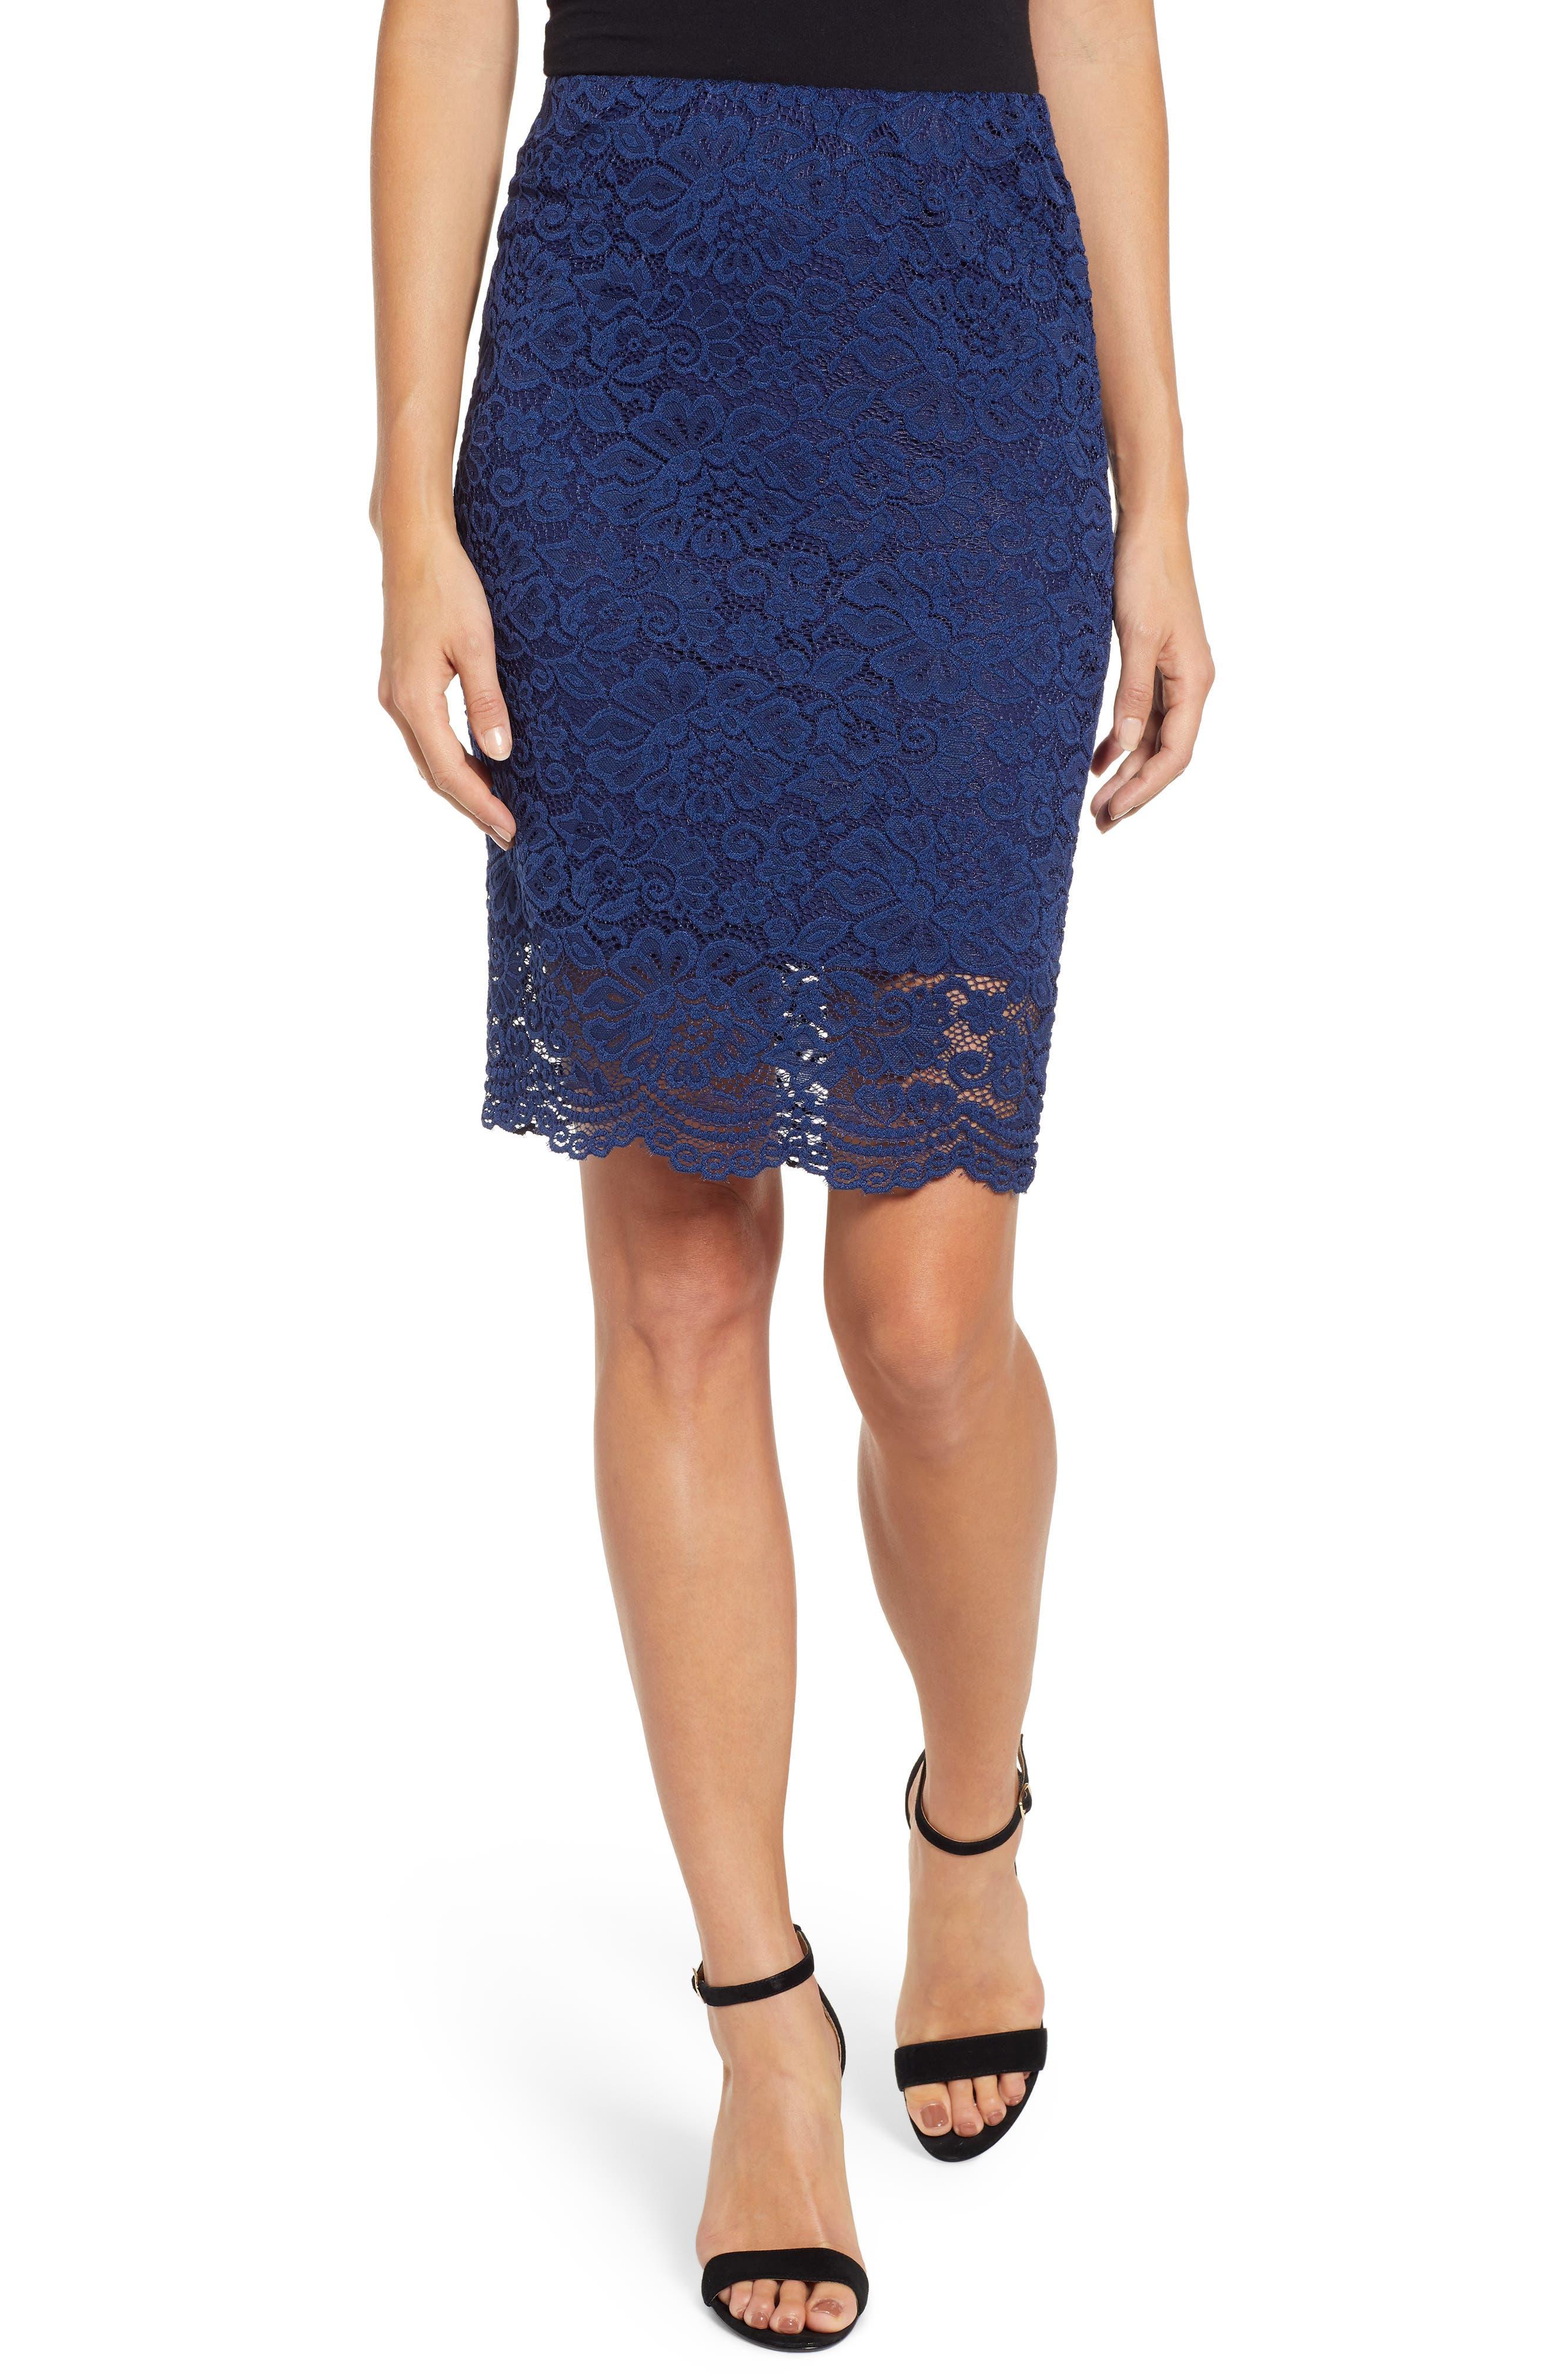 ROSEMUNDE, Filippa Scalloped Lace Skirt, Main thumbnail 1, color, NAVY PEONY